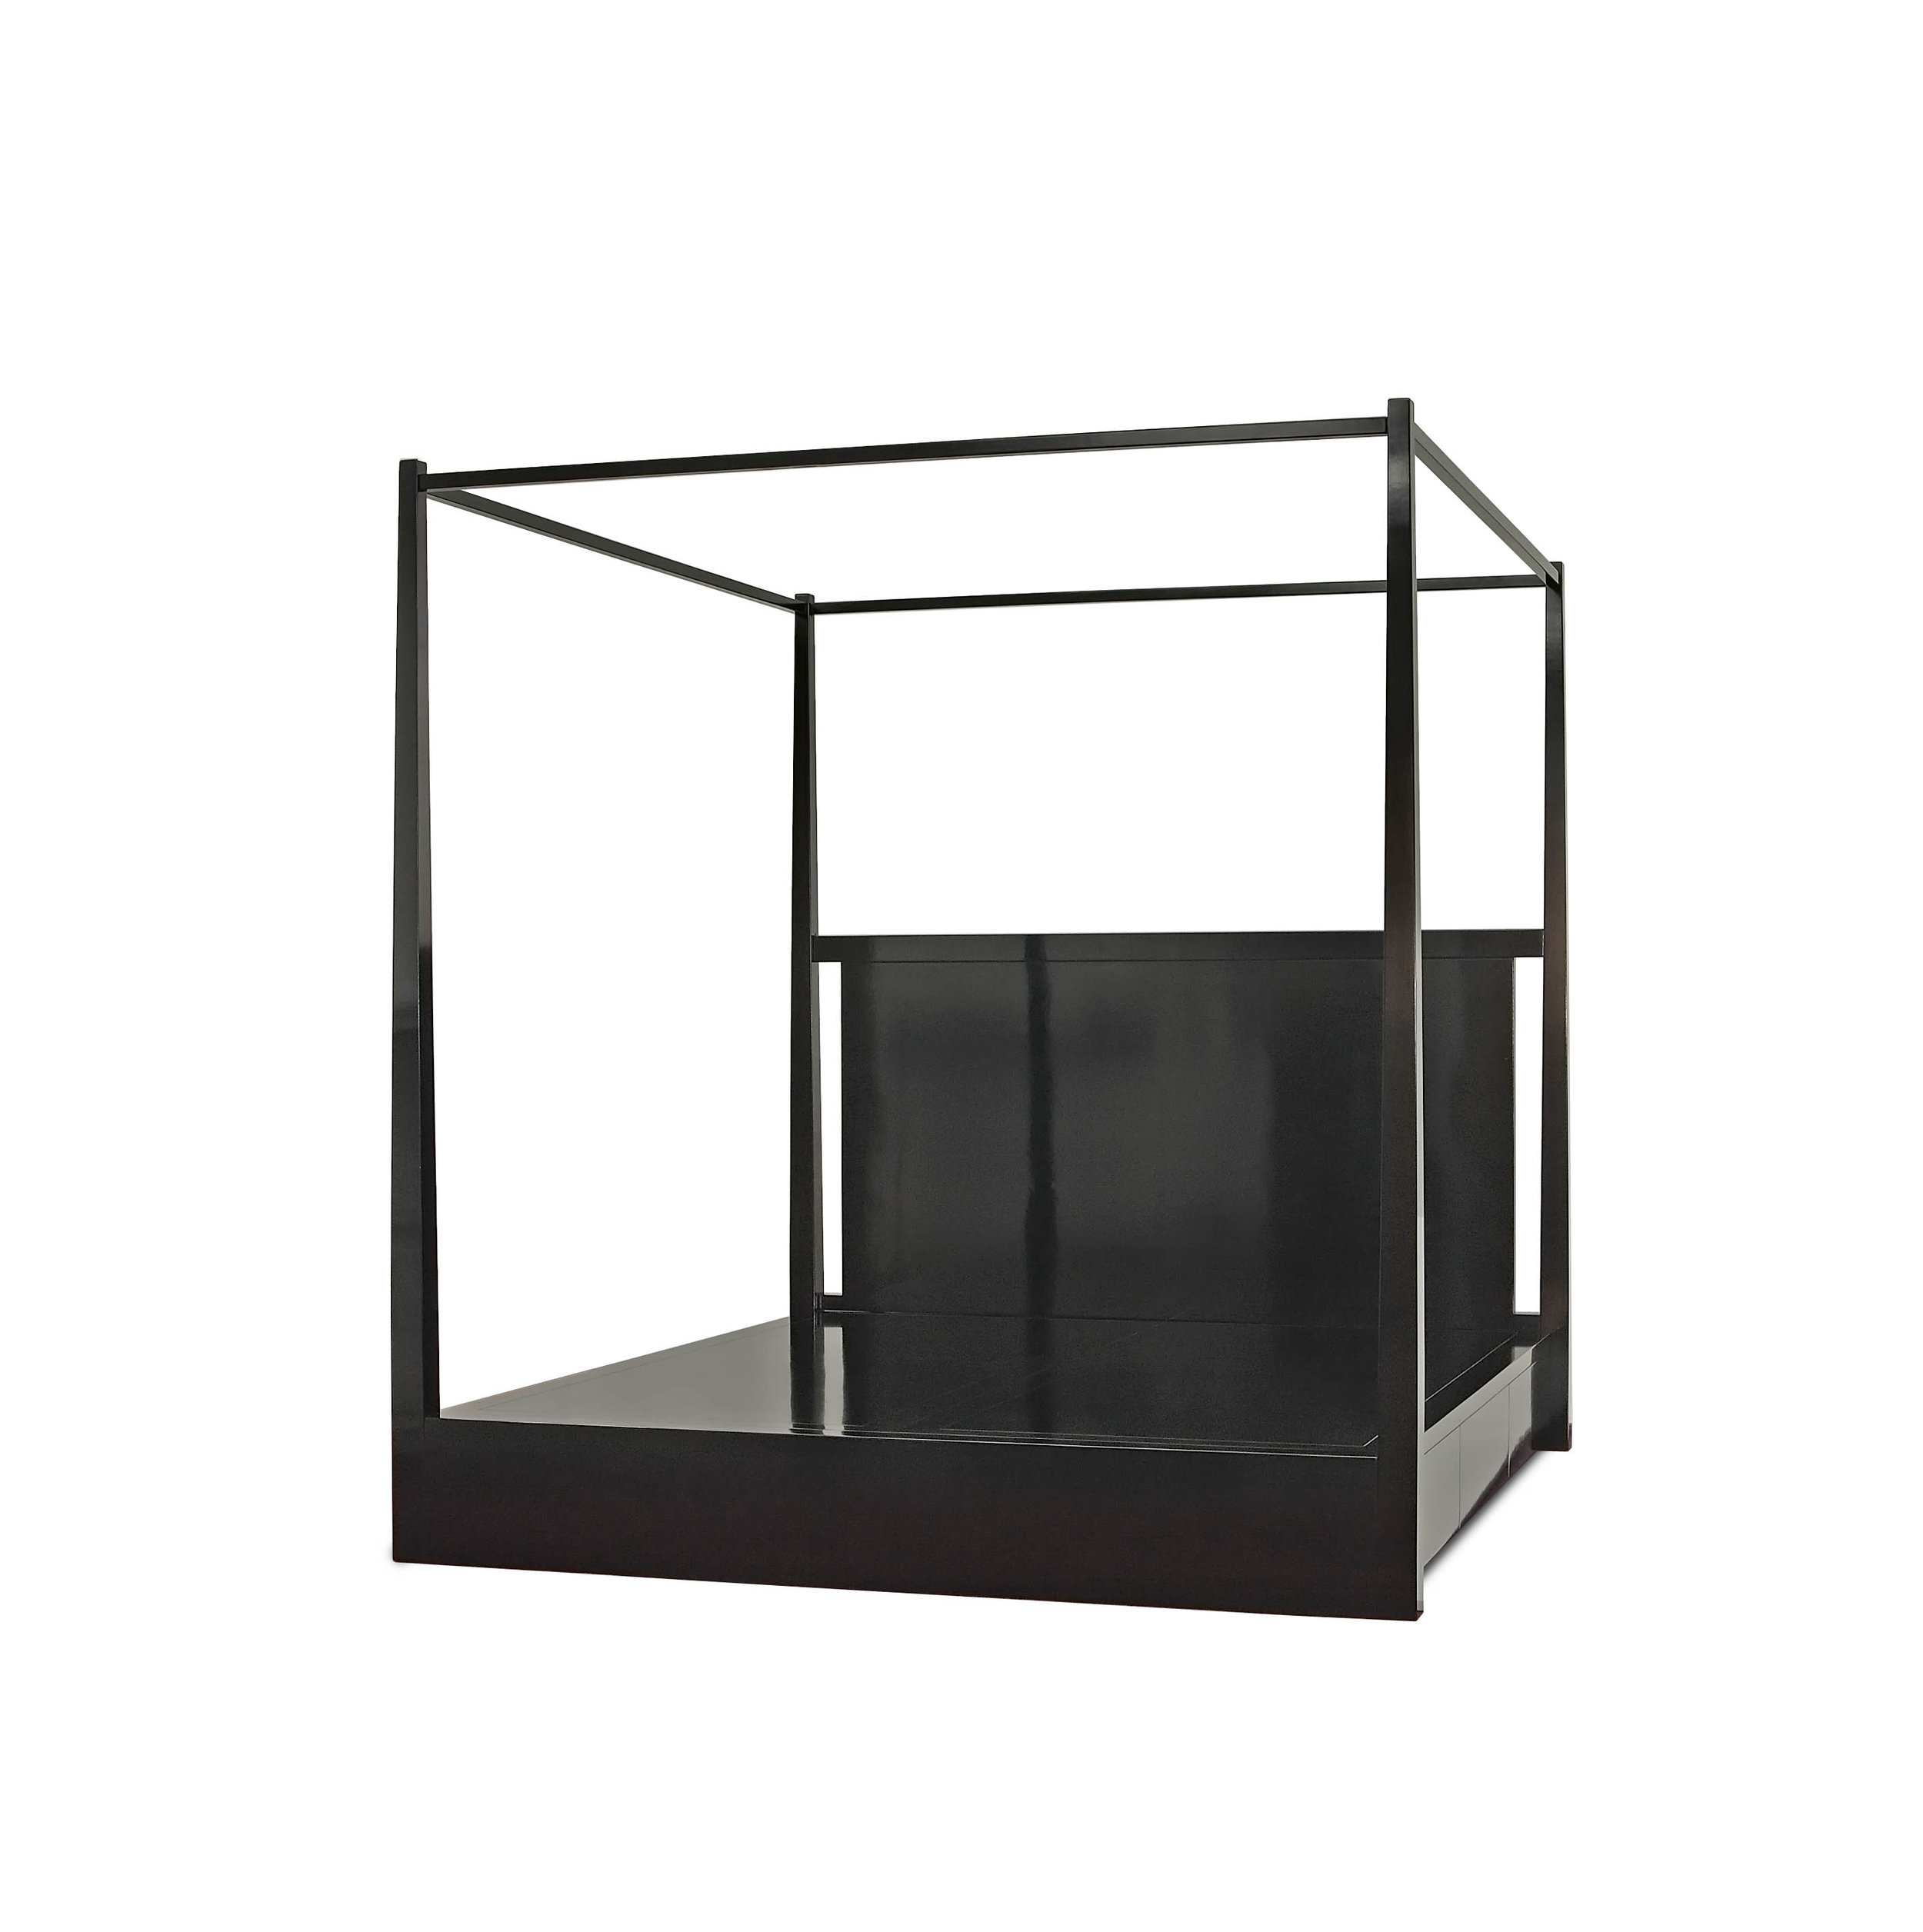 ....modern furniture : canopy bed ..摩登家具 : 架子床....